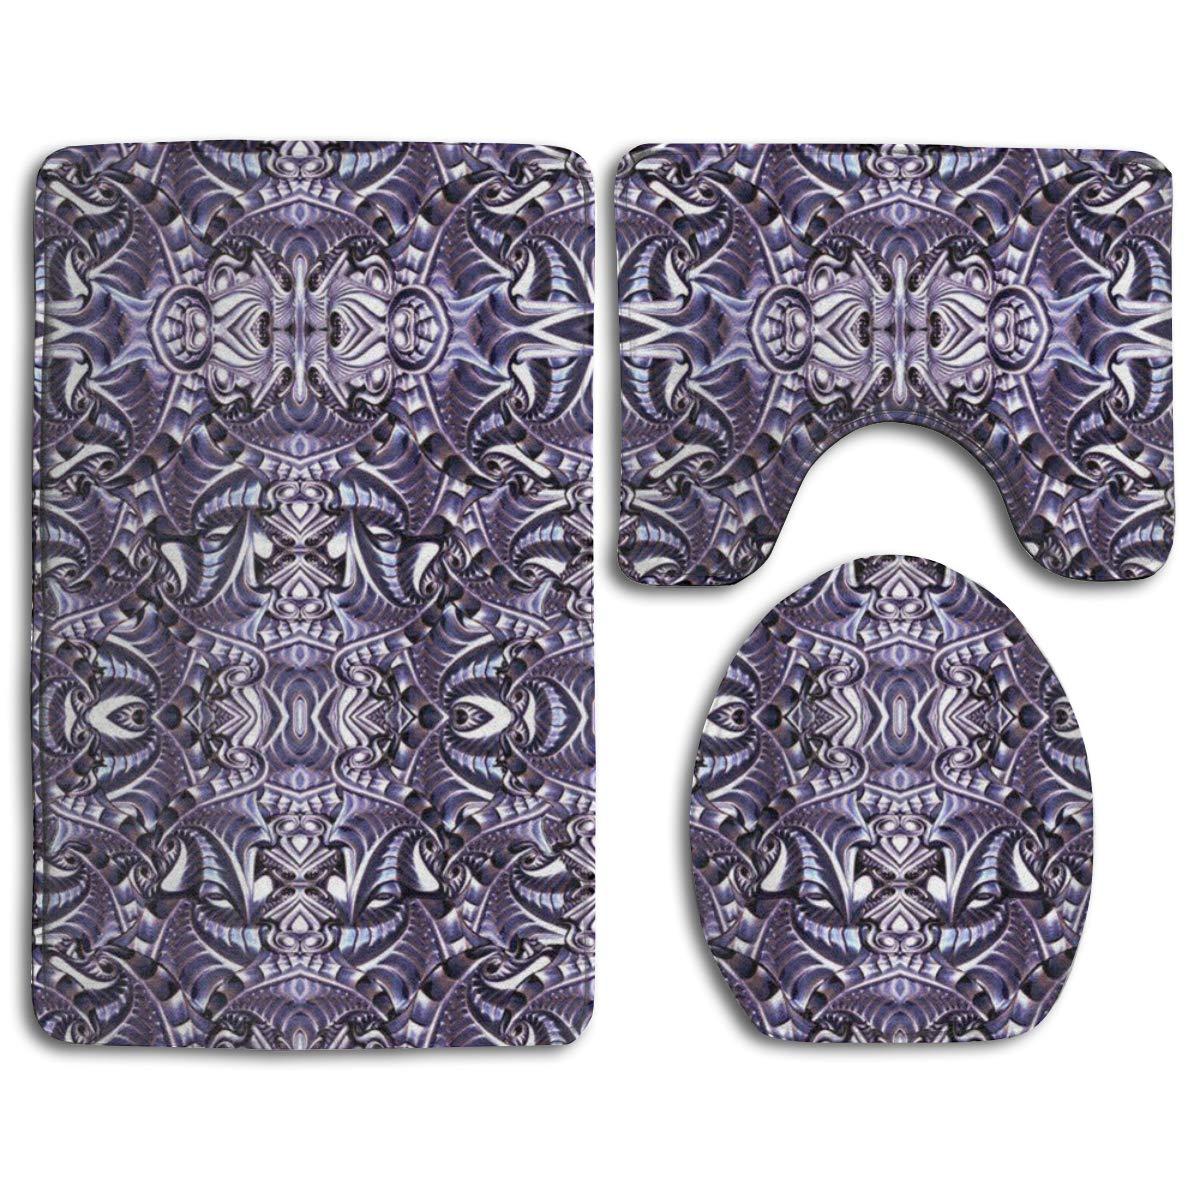 3Pack U-Shape Non-Slip Flannel Bathroom Bath Rug Foam Pad Mat Shower Carpet Mat